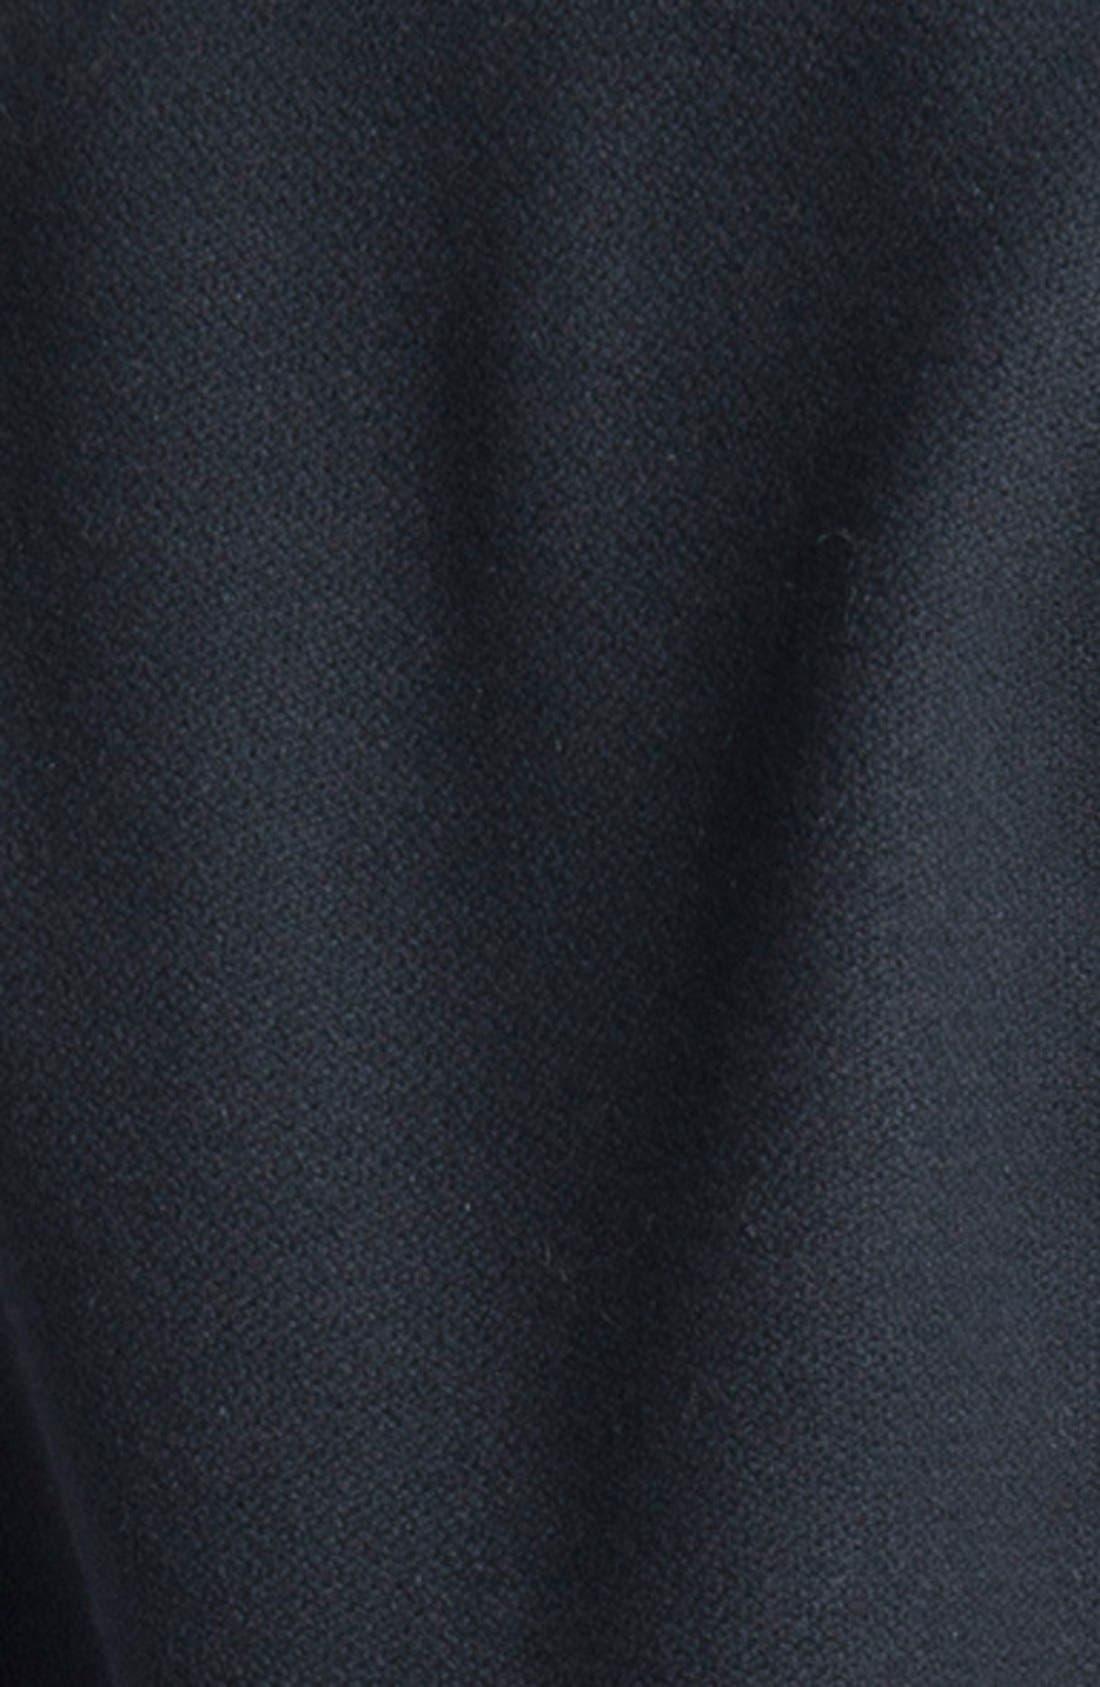 Alternate Image 4  - Saint Laurent 'Teddy' Leather Trim Bomber Jacket